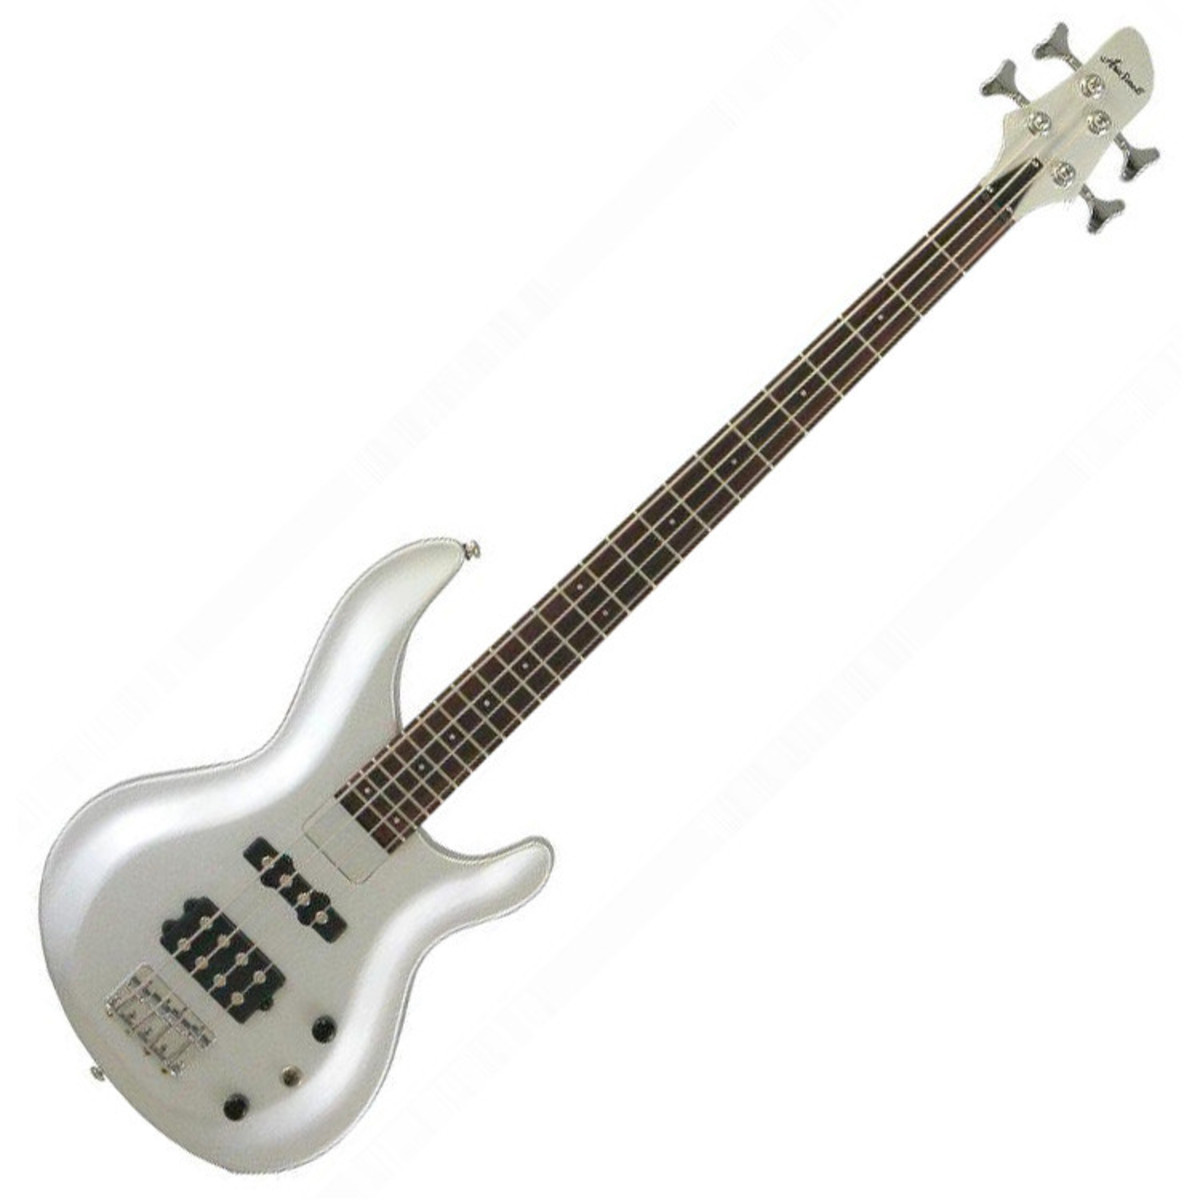 aria igb standard bass guitar pearl white at. Black Bedroom Furniture Sets. Home Design Ideas